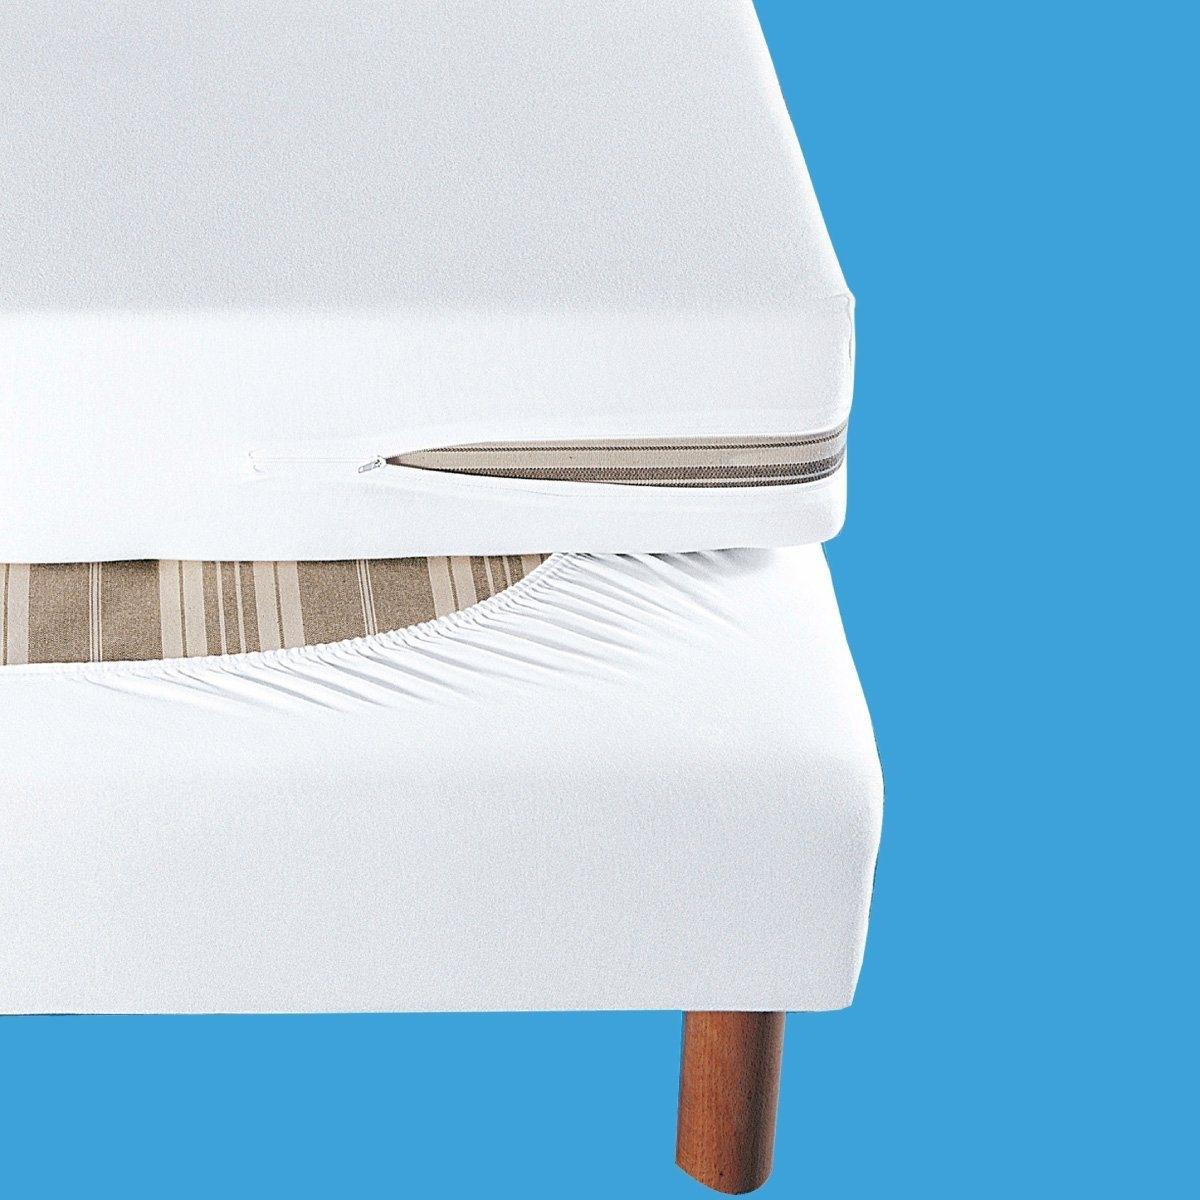 Чехол La Redoute Для боковин кровати 80 x 190 см белый комплект из полотенце для la redoute рук из хлопка и льна nipaly 50 x 100 см белый